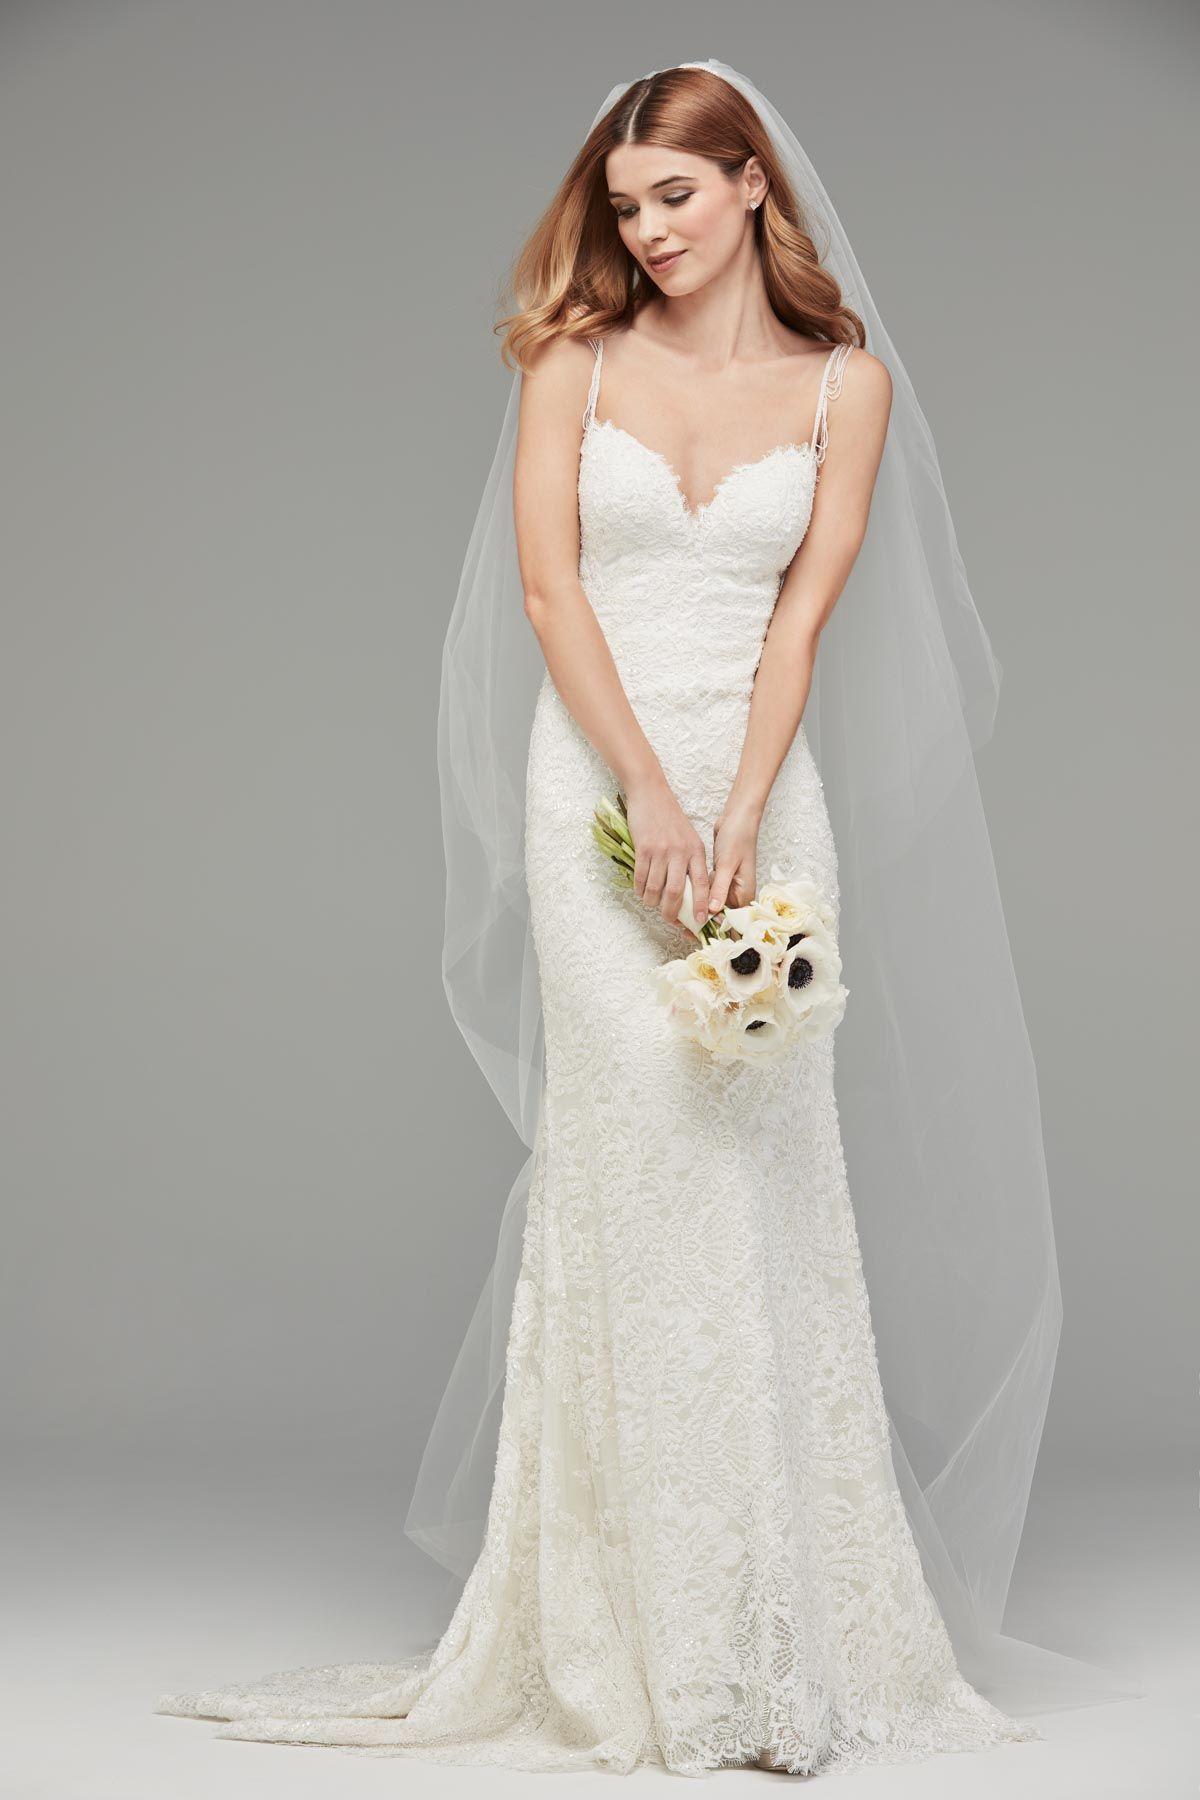 Hasdiel 3010B   Watters Brides   Watters   Bridal gown   Pinterest ...